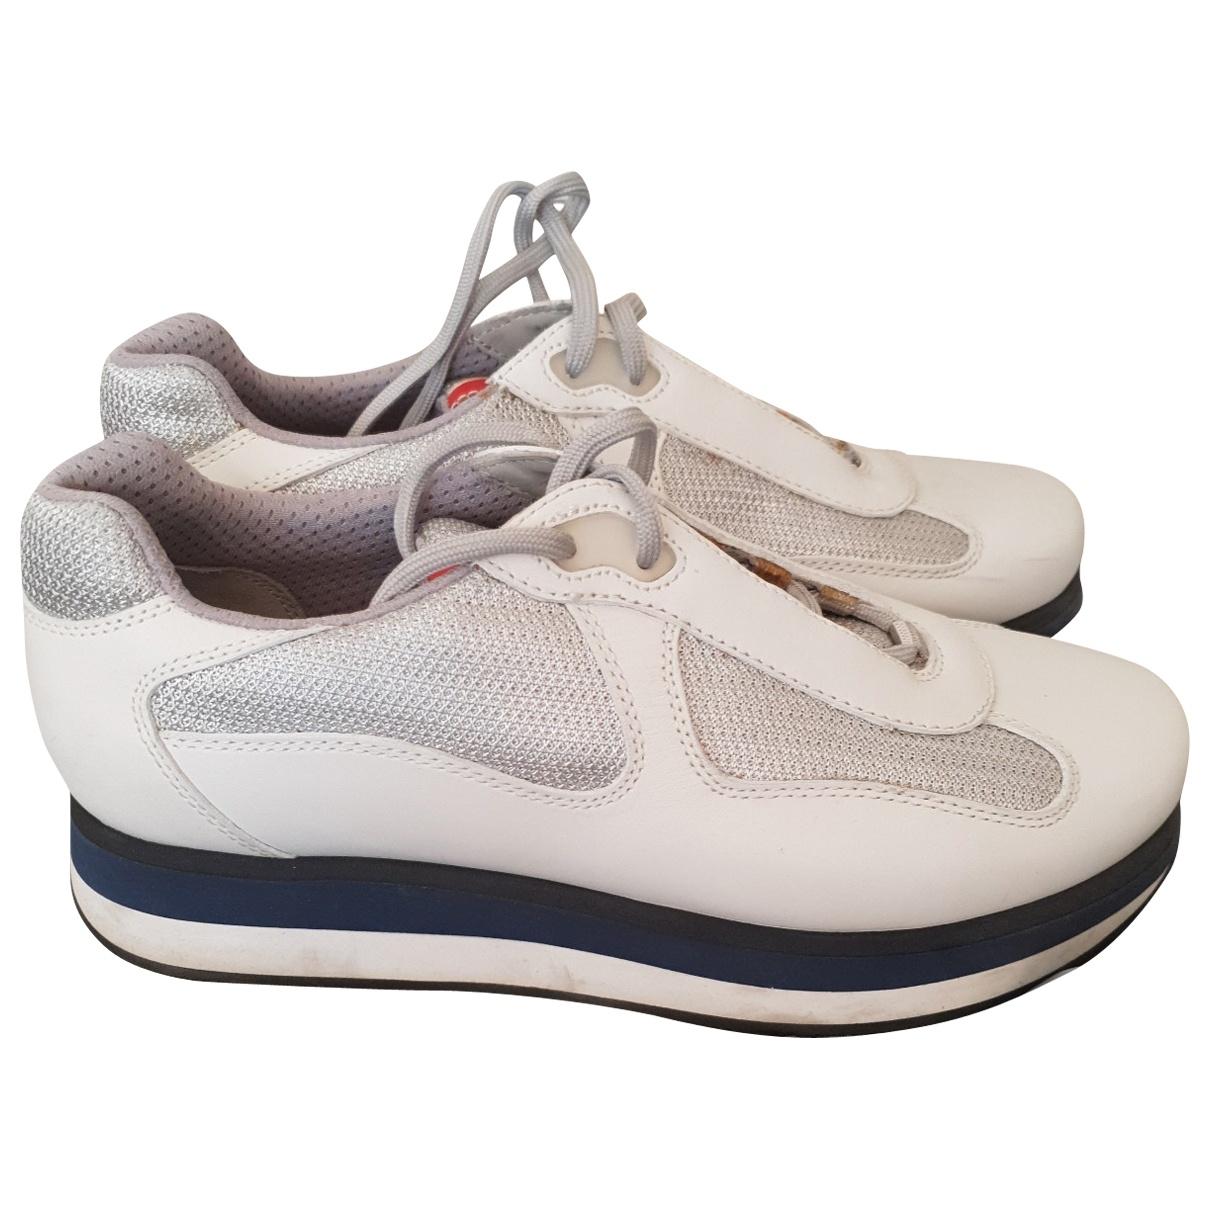 Prada \N White Leather Trainers for Men 6 UK